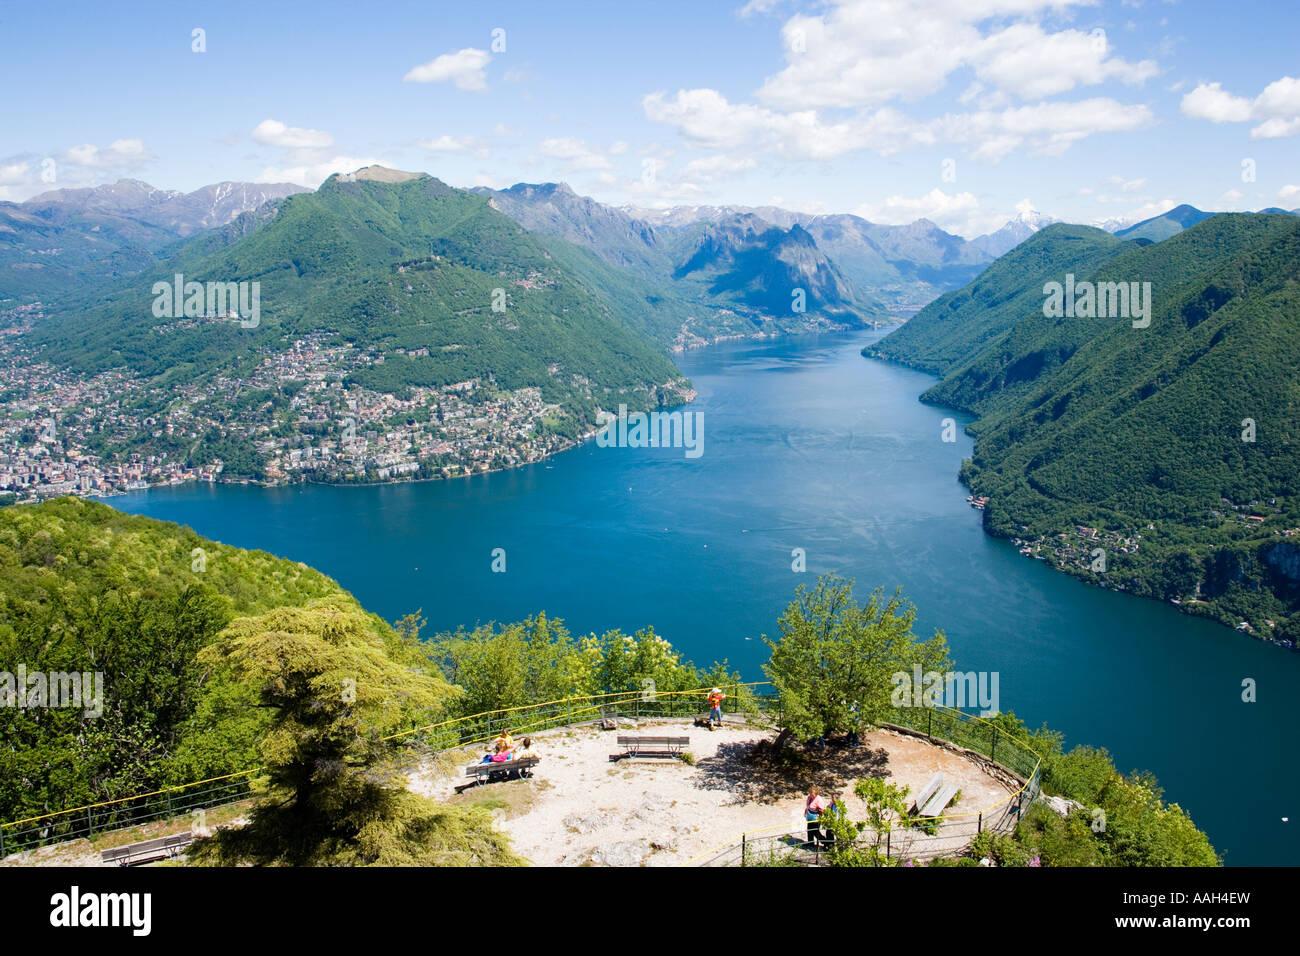 view from Monte San Salvatore 912 m over Lake Lugano and Lugano people resting on benches Lugano Ticino Switzerland Stock Photo